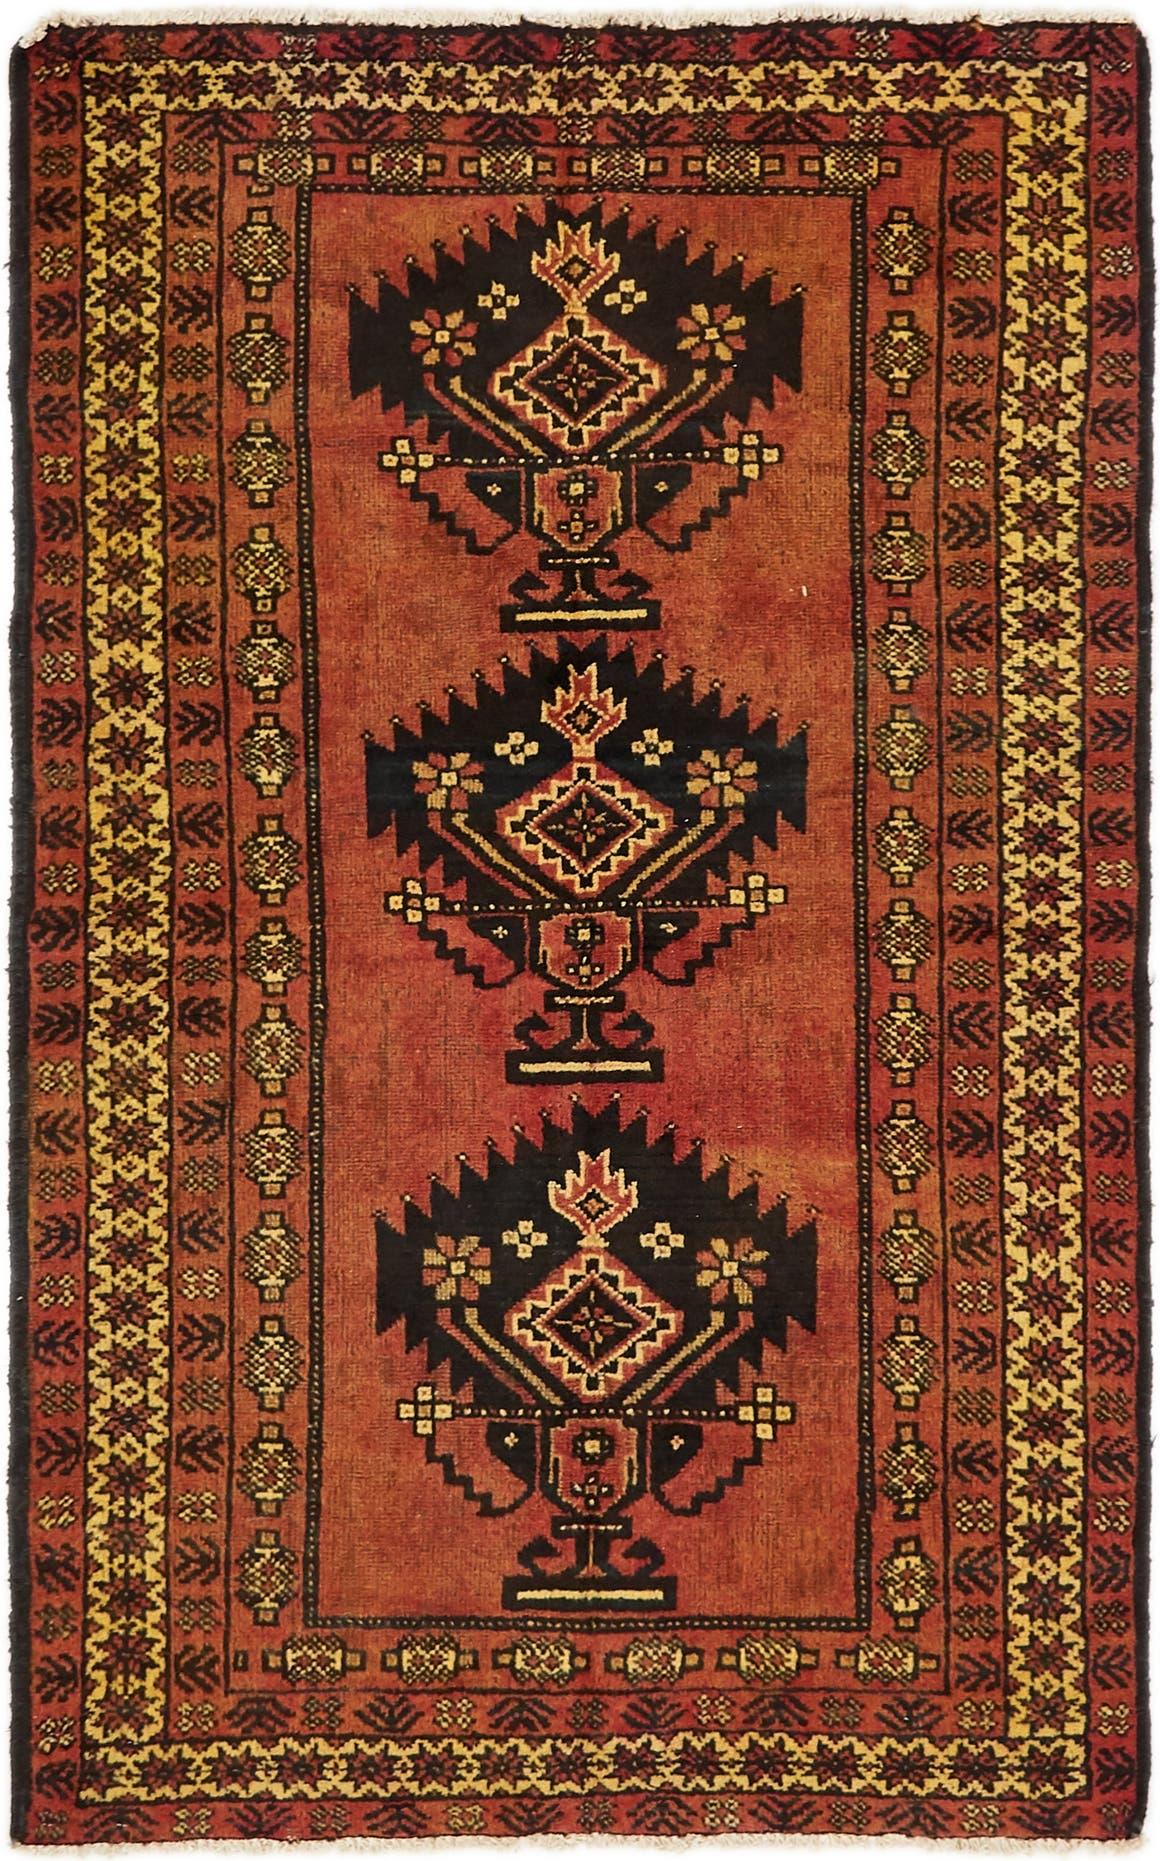 4' x 6' 10 Shiraz-Lori Persian Rug main image